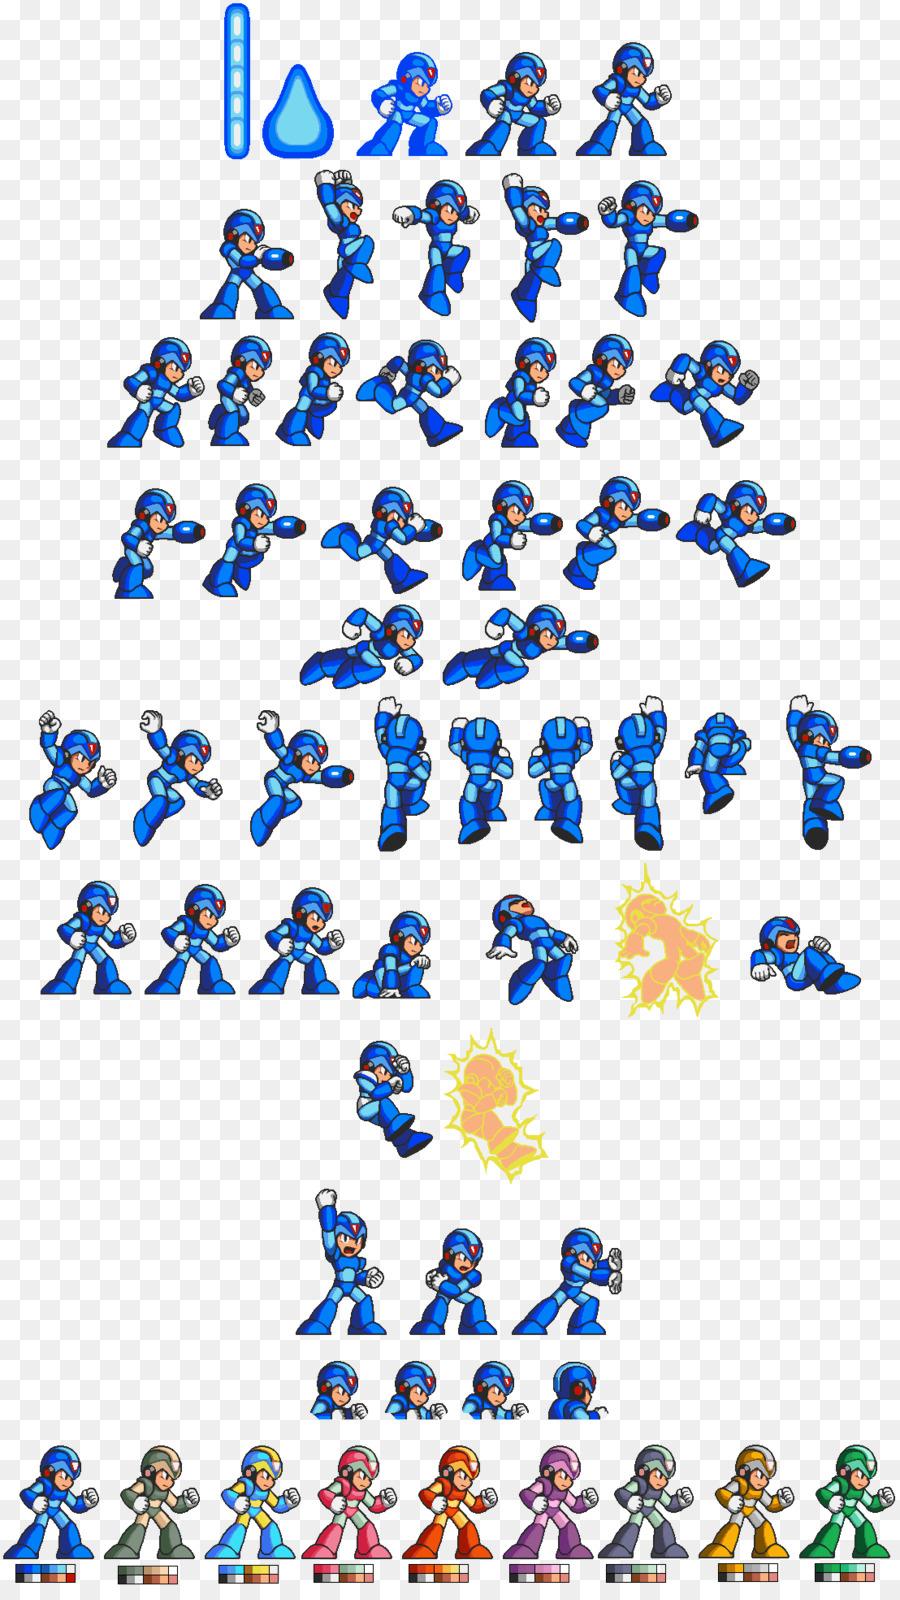 Mega Man X Sprite Game Sprite Png Download 1108 1952